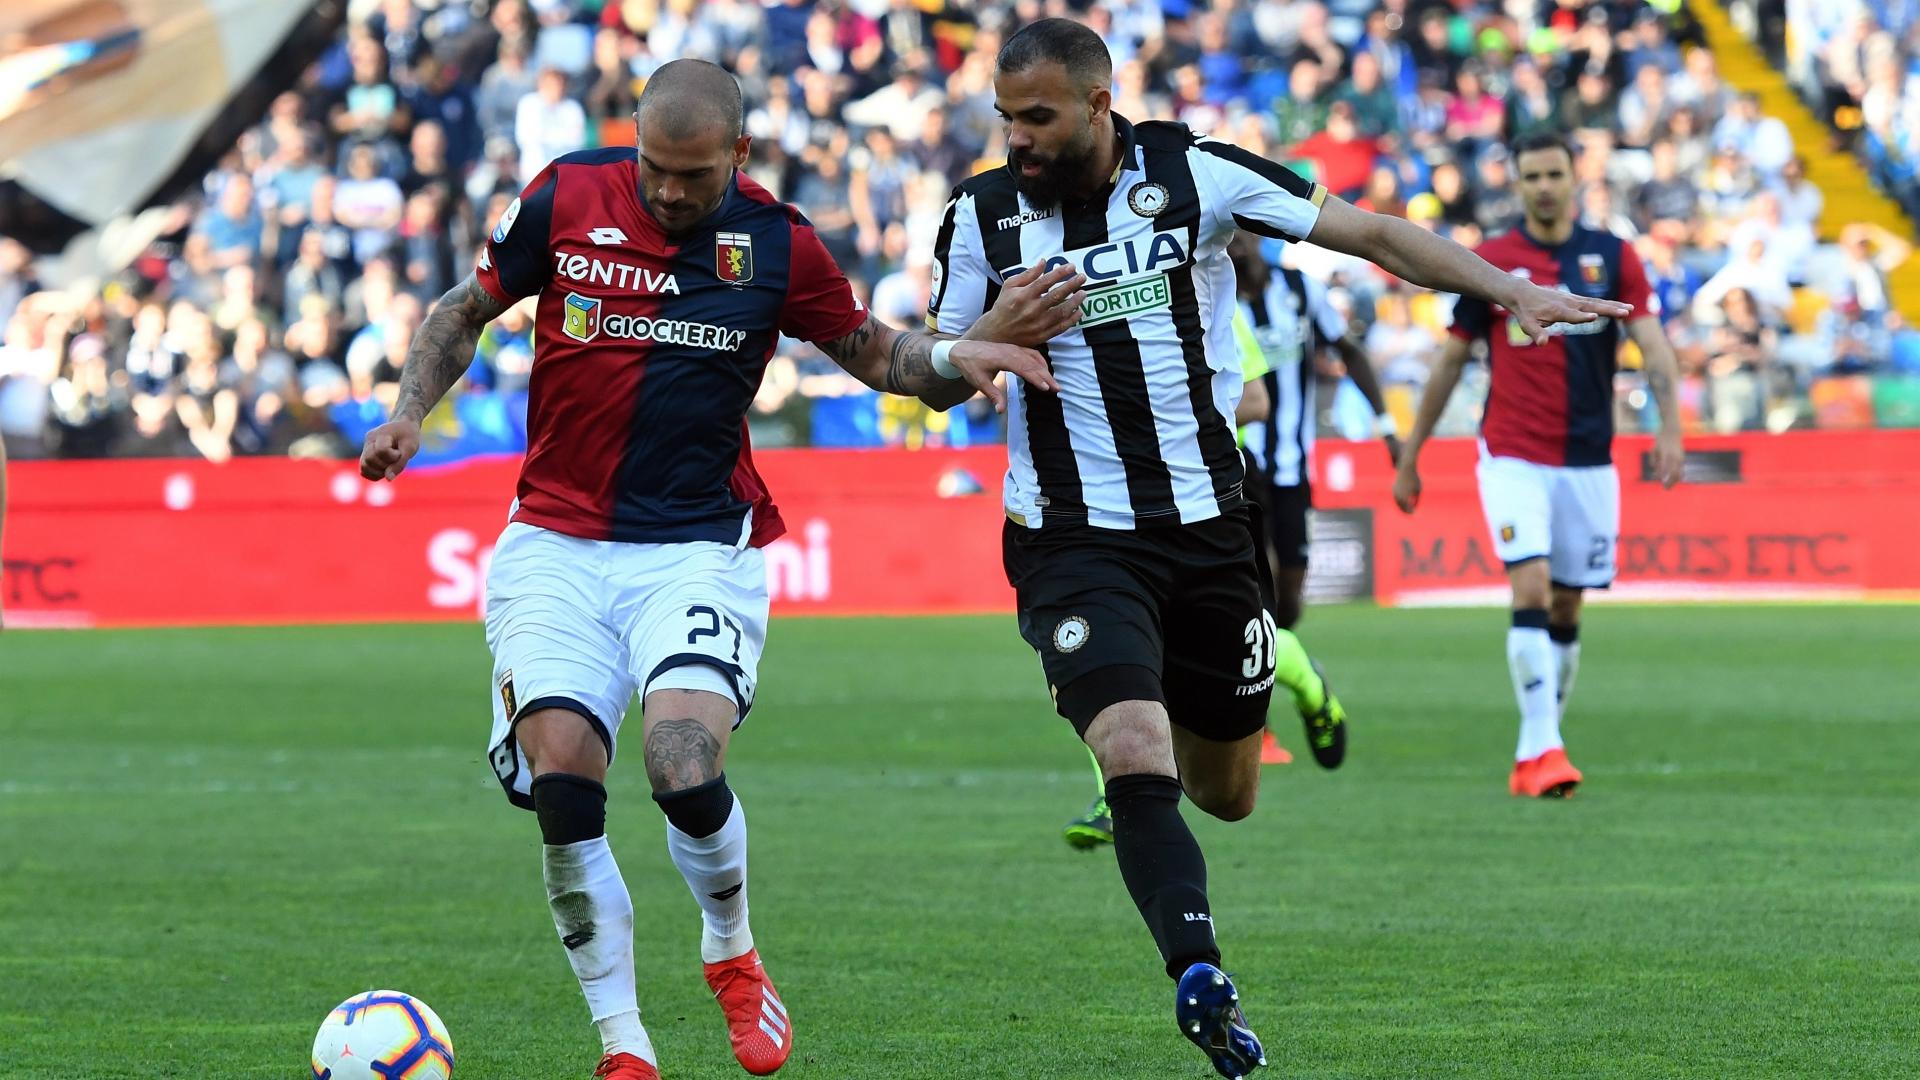 Stefano Sturaro Sandro Raniere Udinese Genoa Serie A 03302019